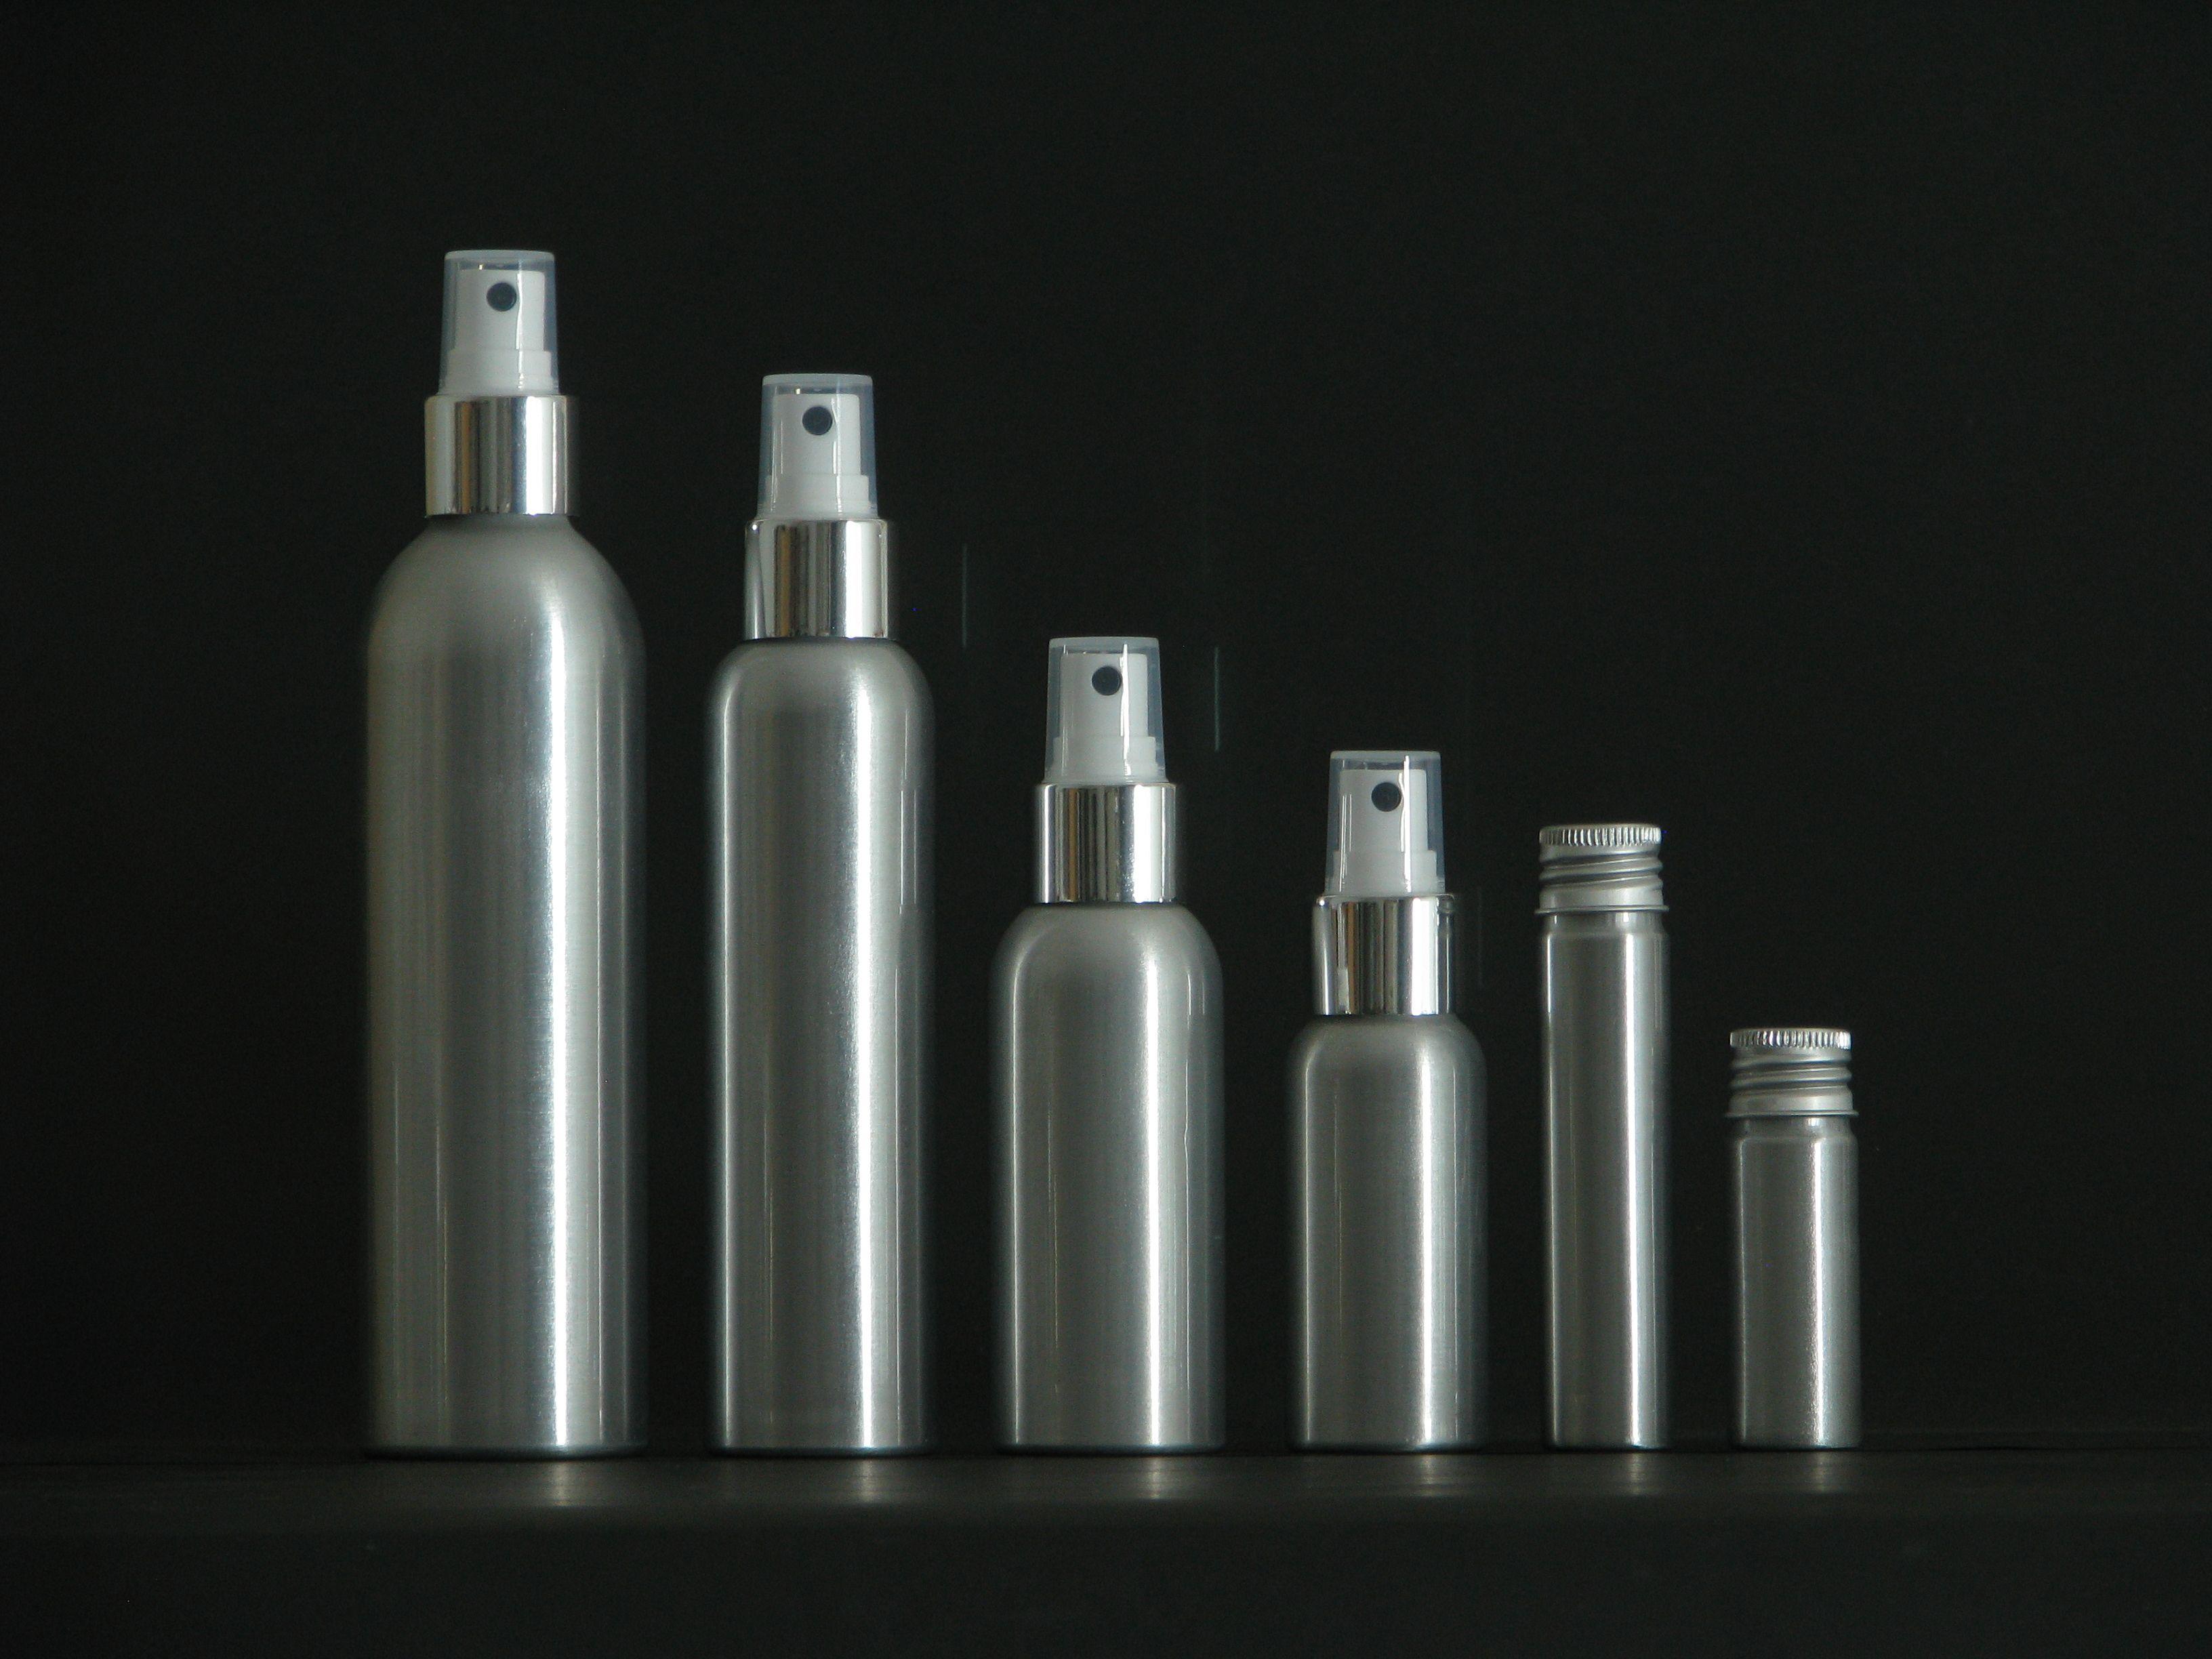 20ml250ml Aluminum Cosmetic Shampoo Pump Spray Bottle Our